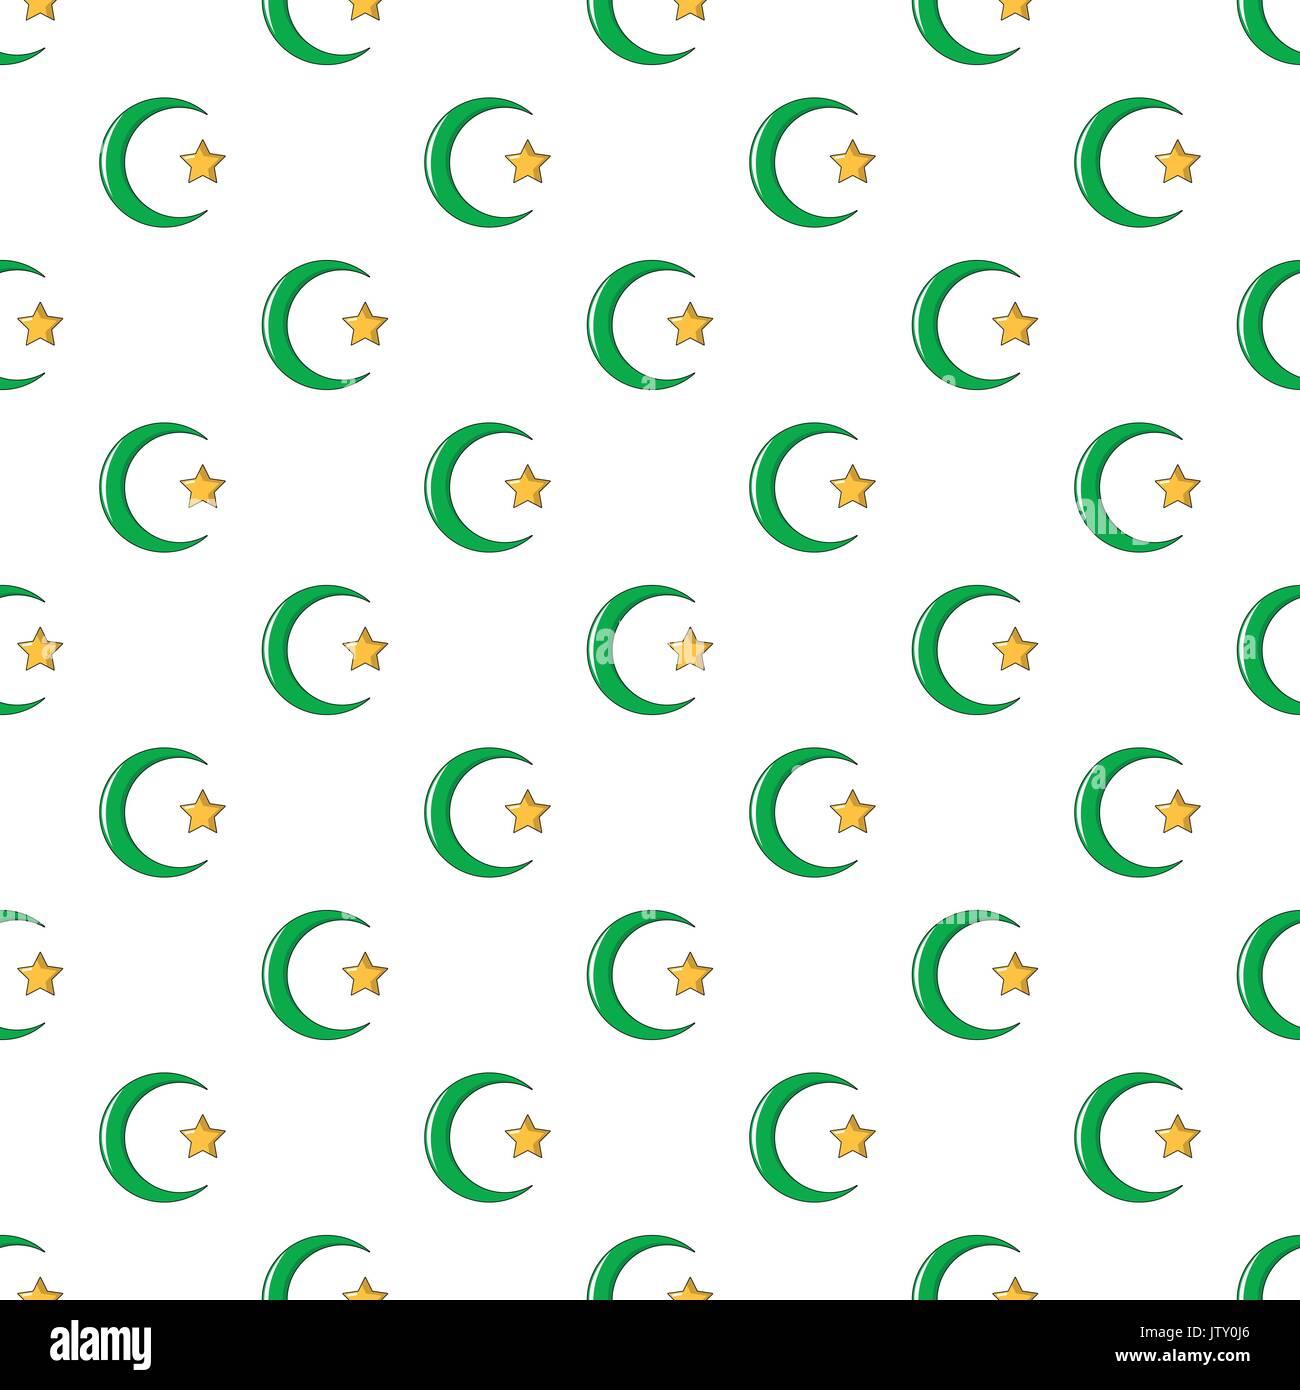 Starcrescent symbol of islam pattern seamless stock vector art starcrescent symbol of islam pattern seamless buycottarizona Gallery